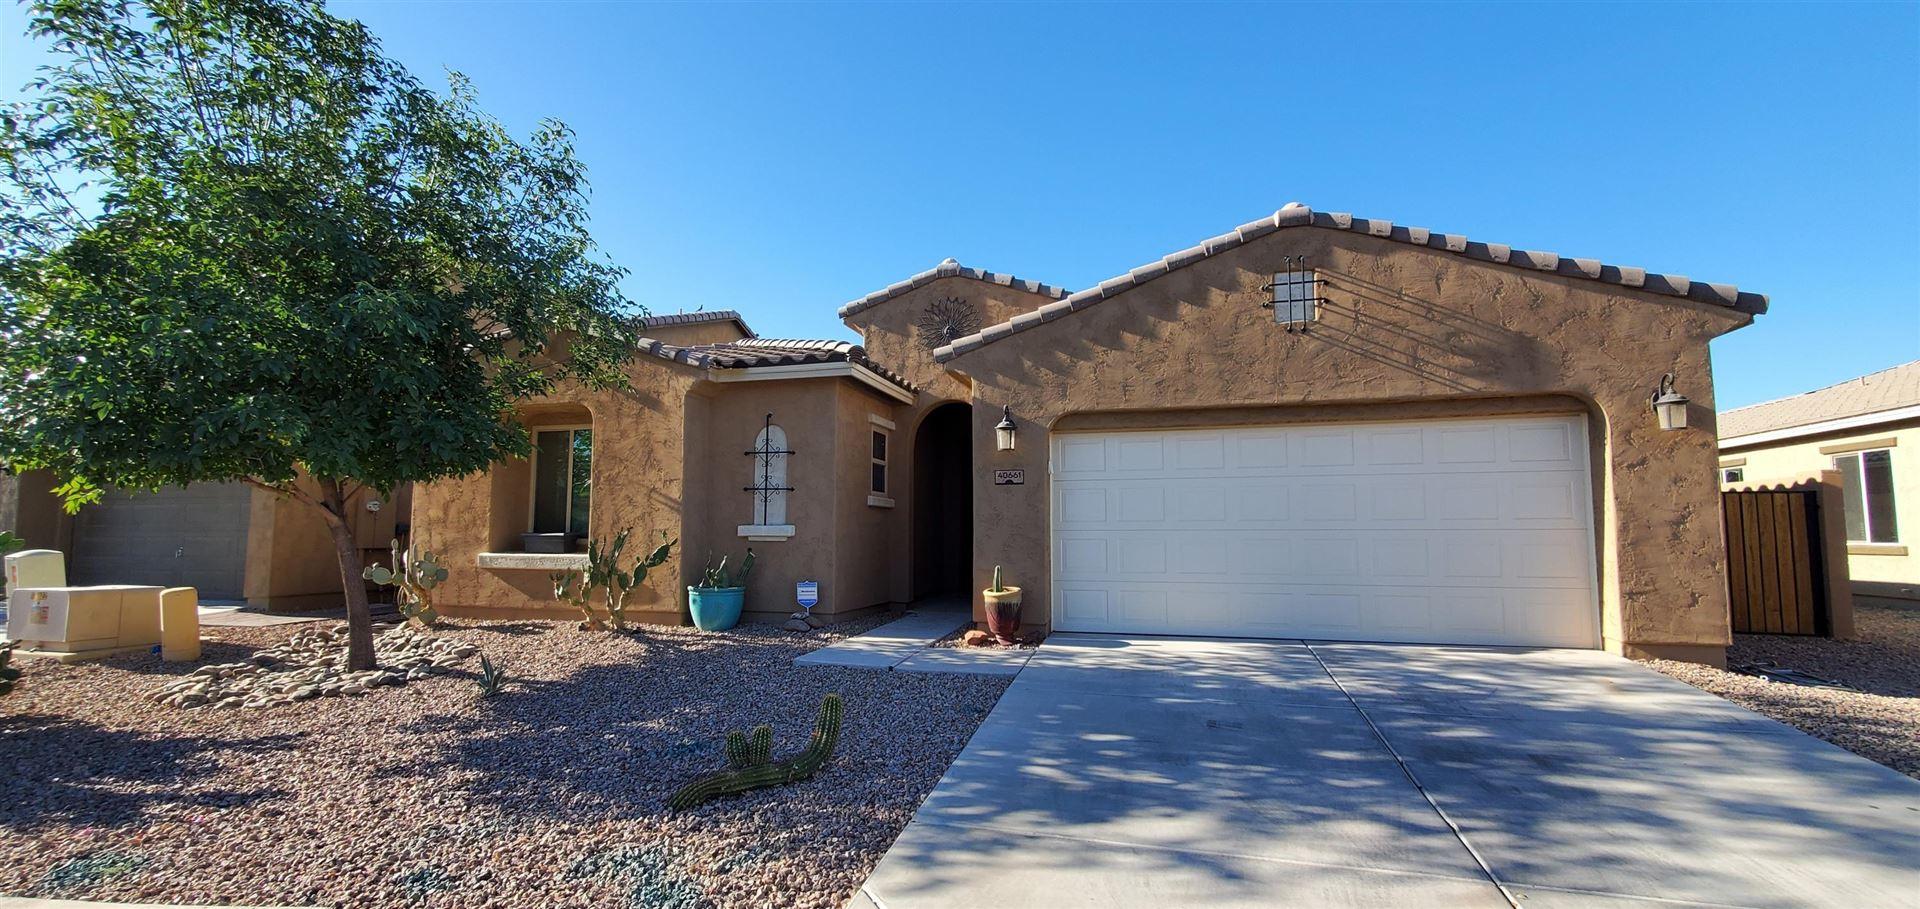 Photo for 40661 W Park Hill Drive, Maricopa, AZ 85138 (MLS # 6229486)